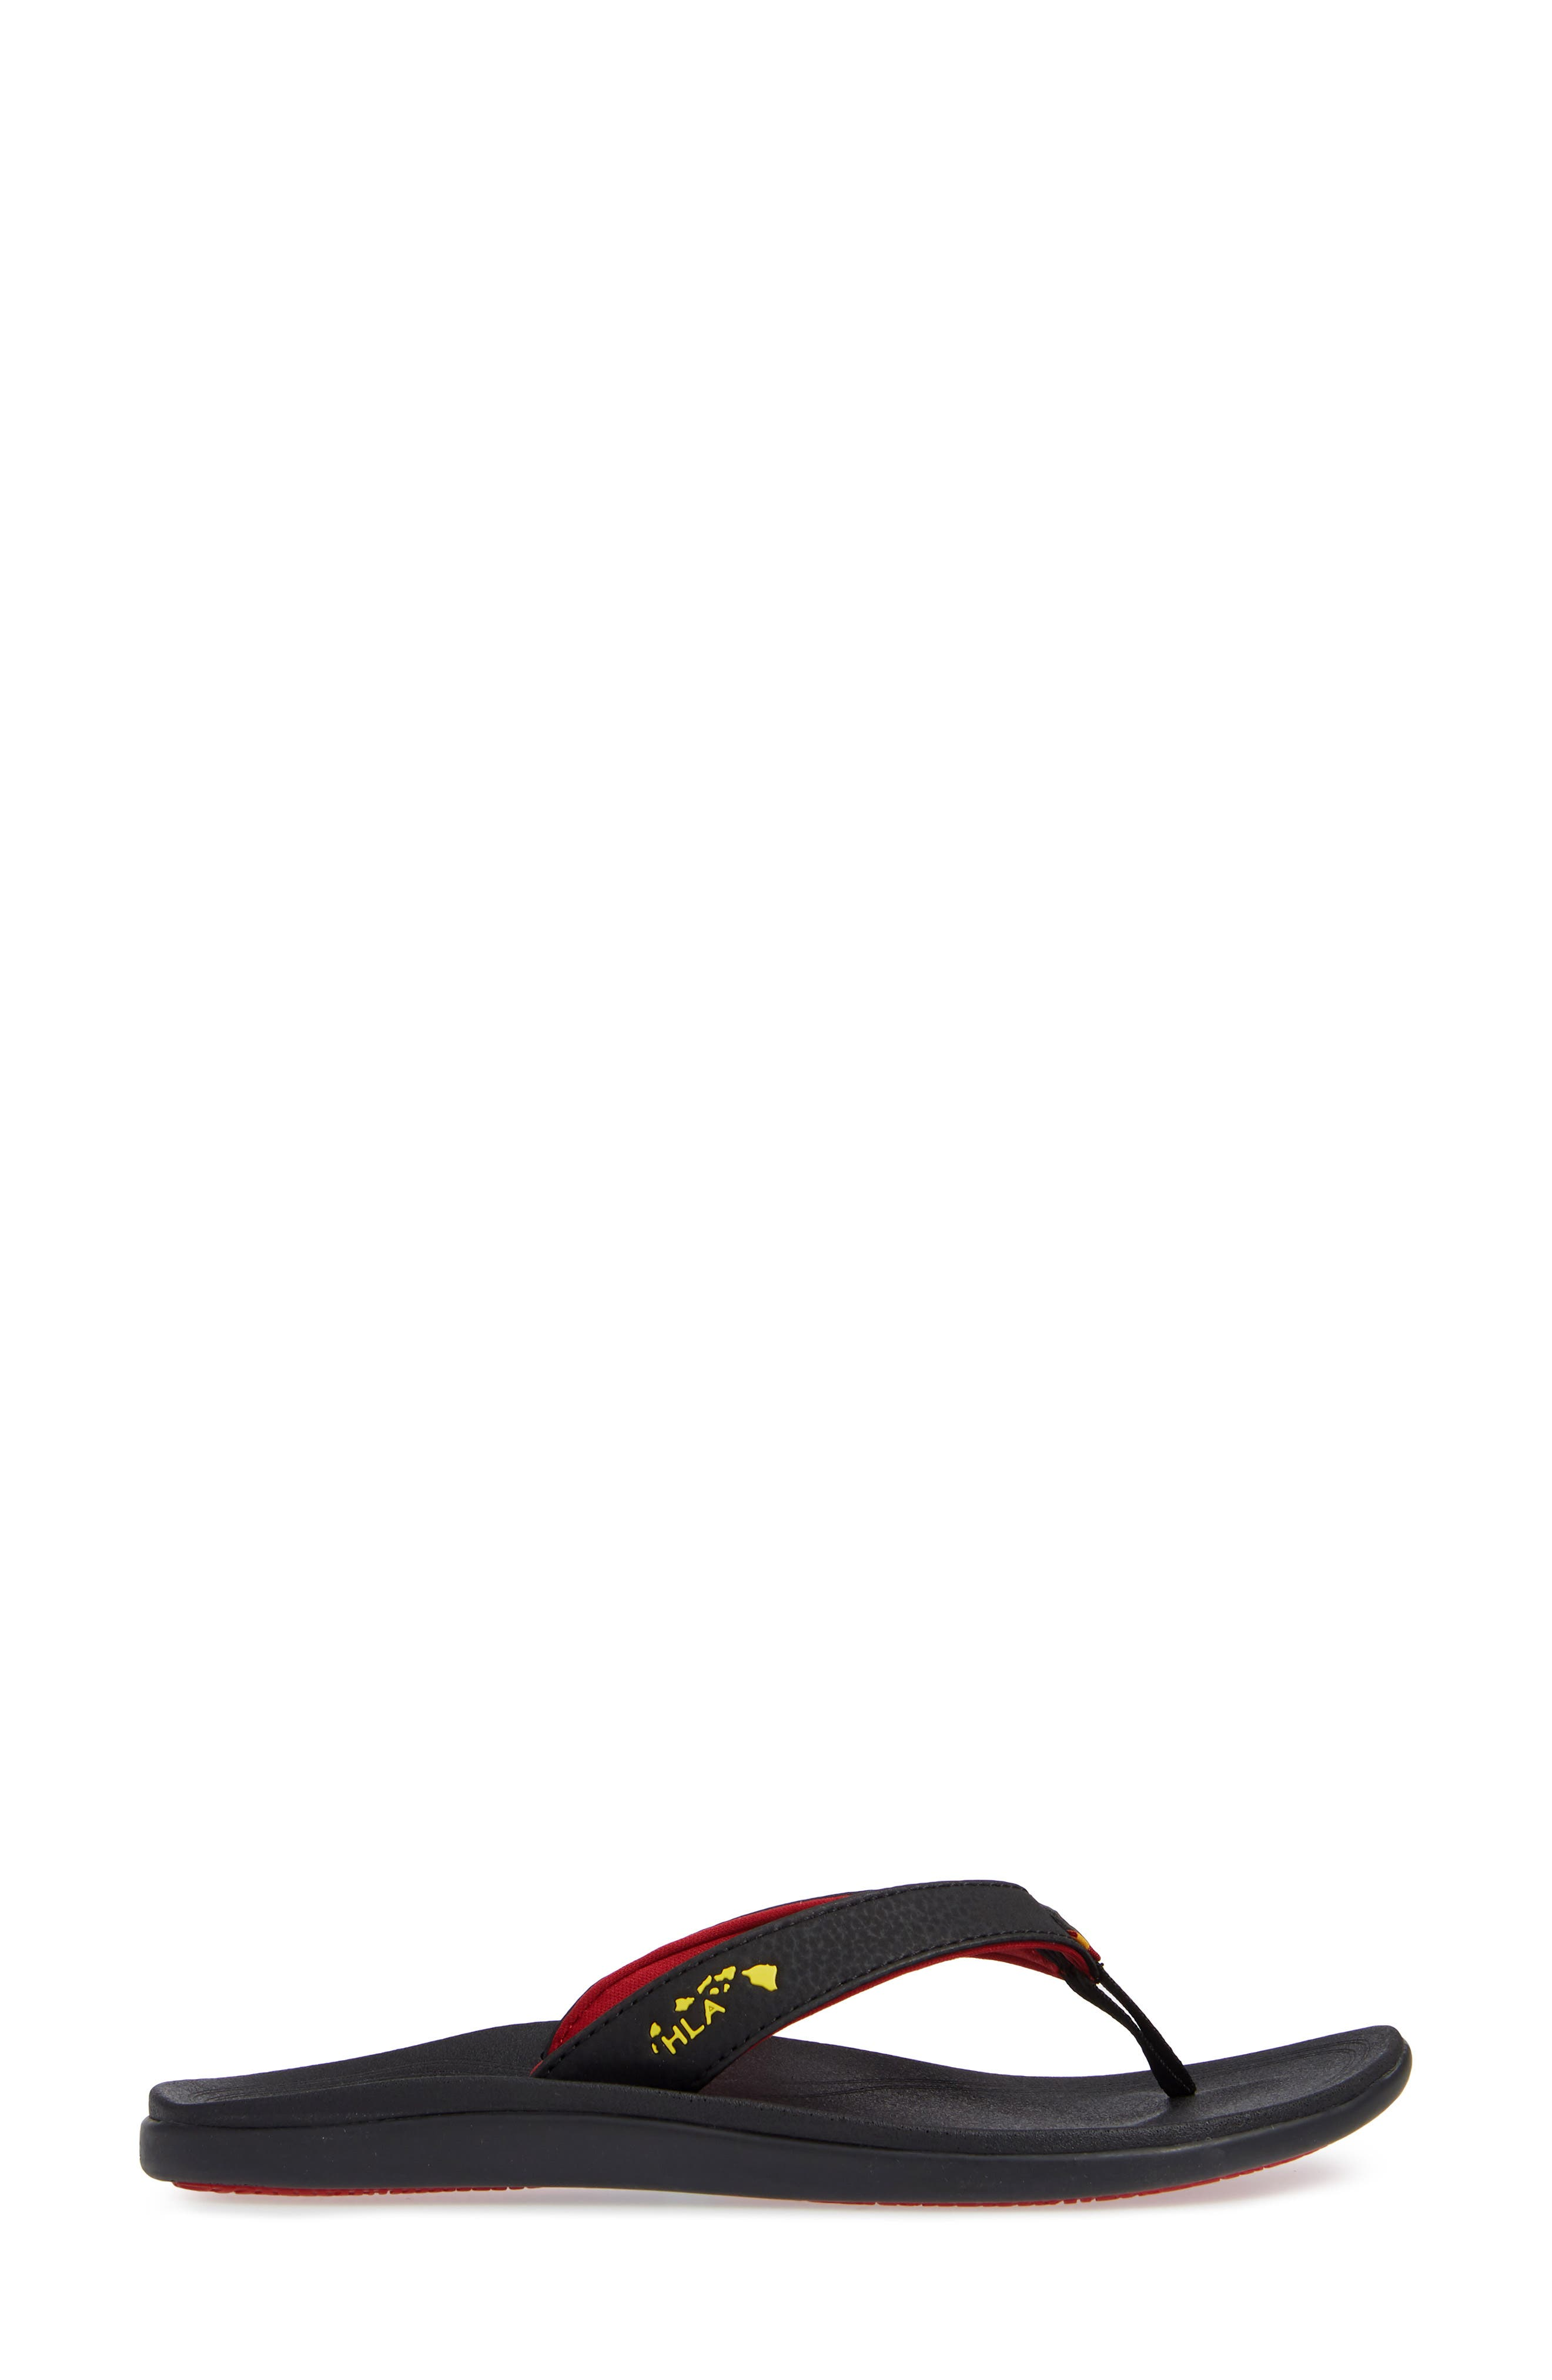 Punua Kiai Flip Flop,                             Alternate thumbnail 3, color,                             BLACK/ BLACK FABRIC